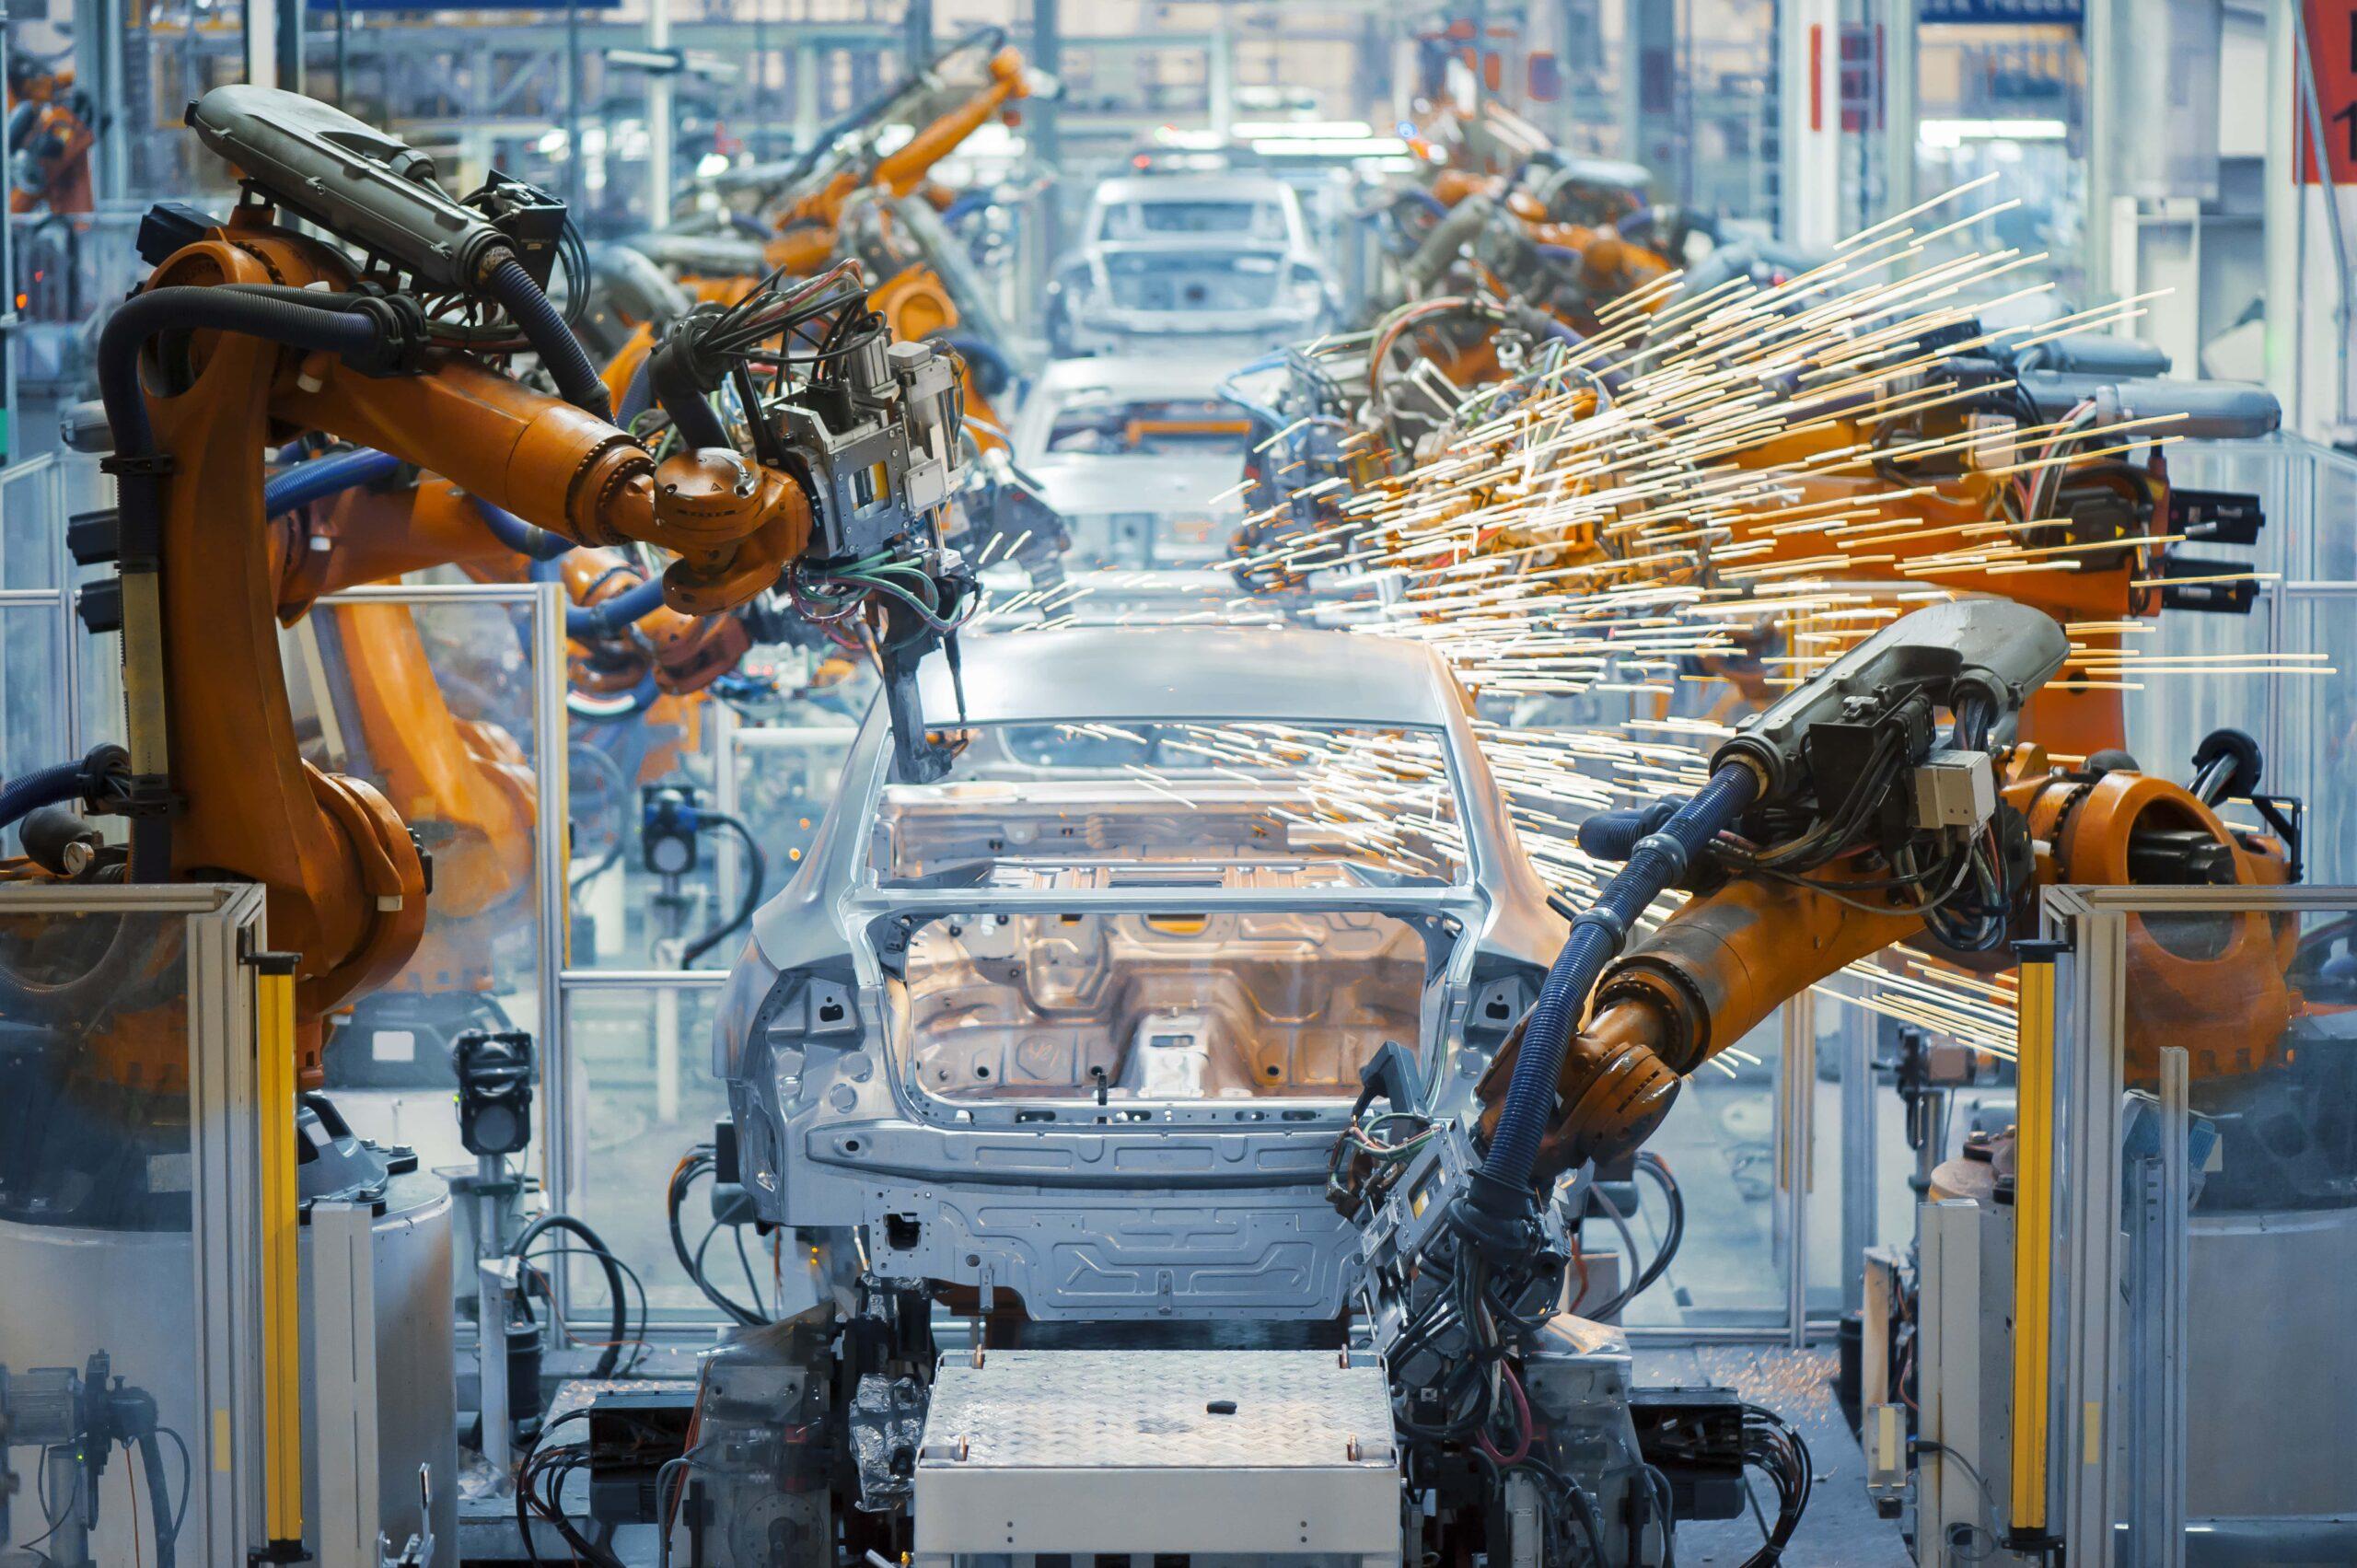 Automated mechanical arms building a car